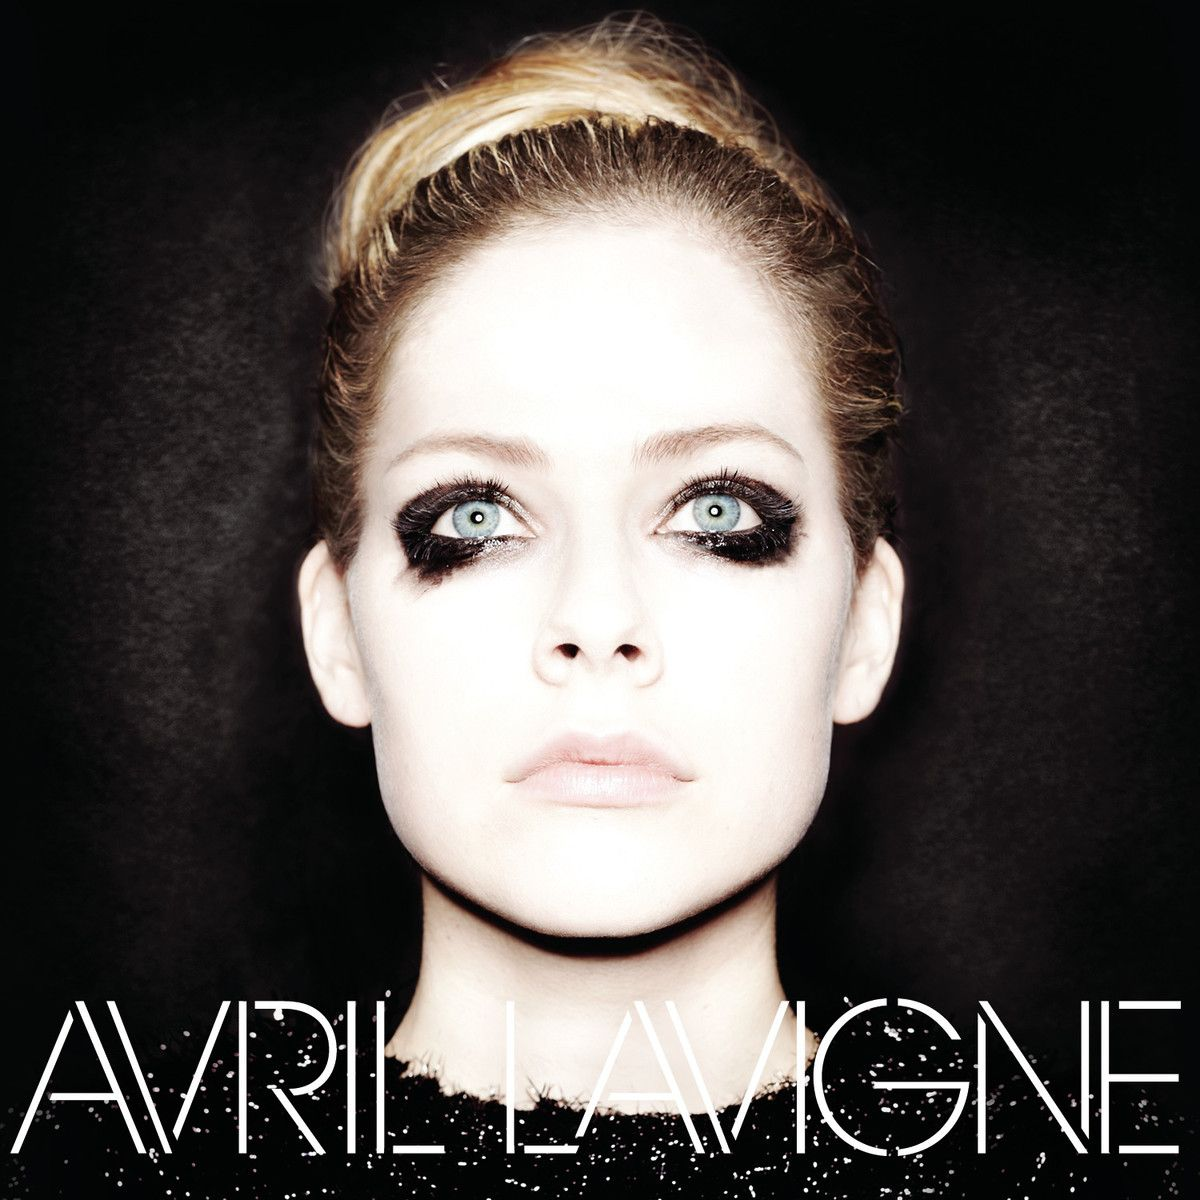 Avril Lavigne - Avril Lavigne album cover